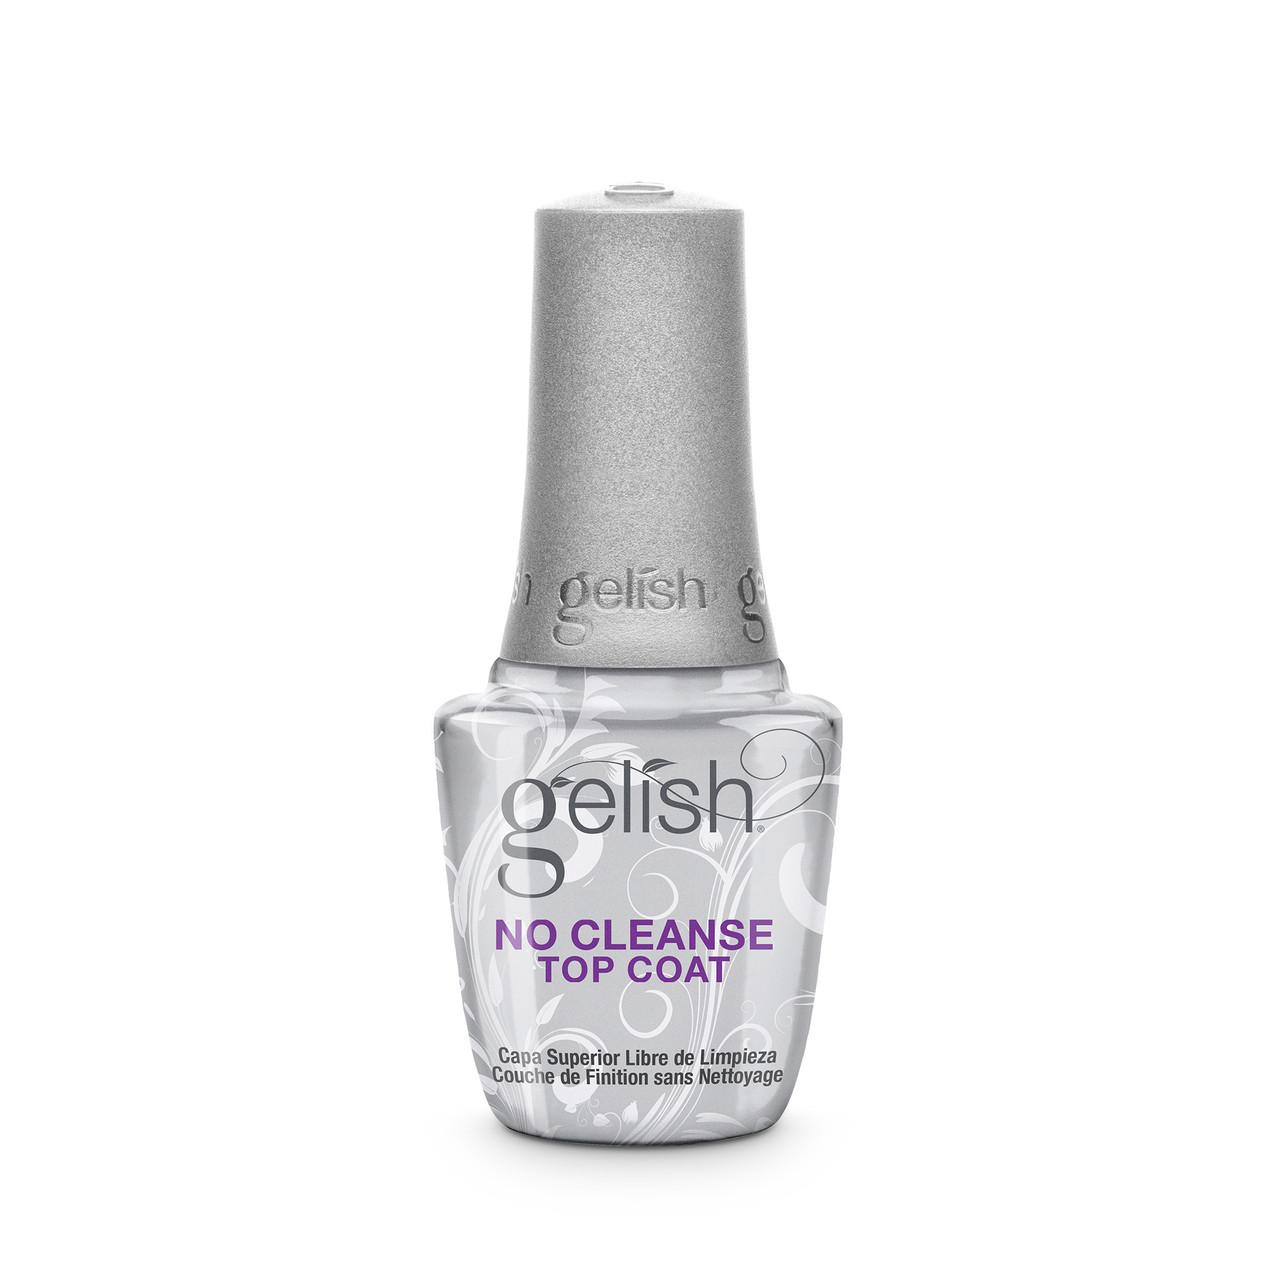 Gelish No Cleanse Soak-Off Gel Top Coat, 15 mL | .5 fl. oz.